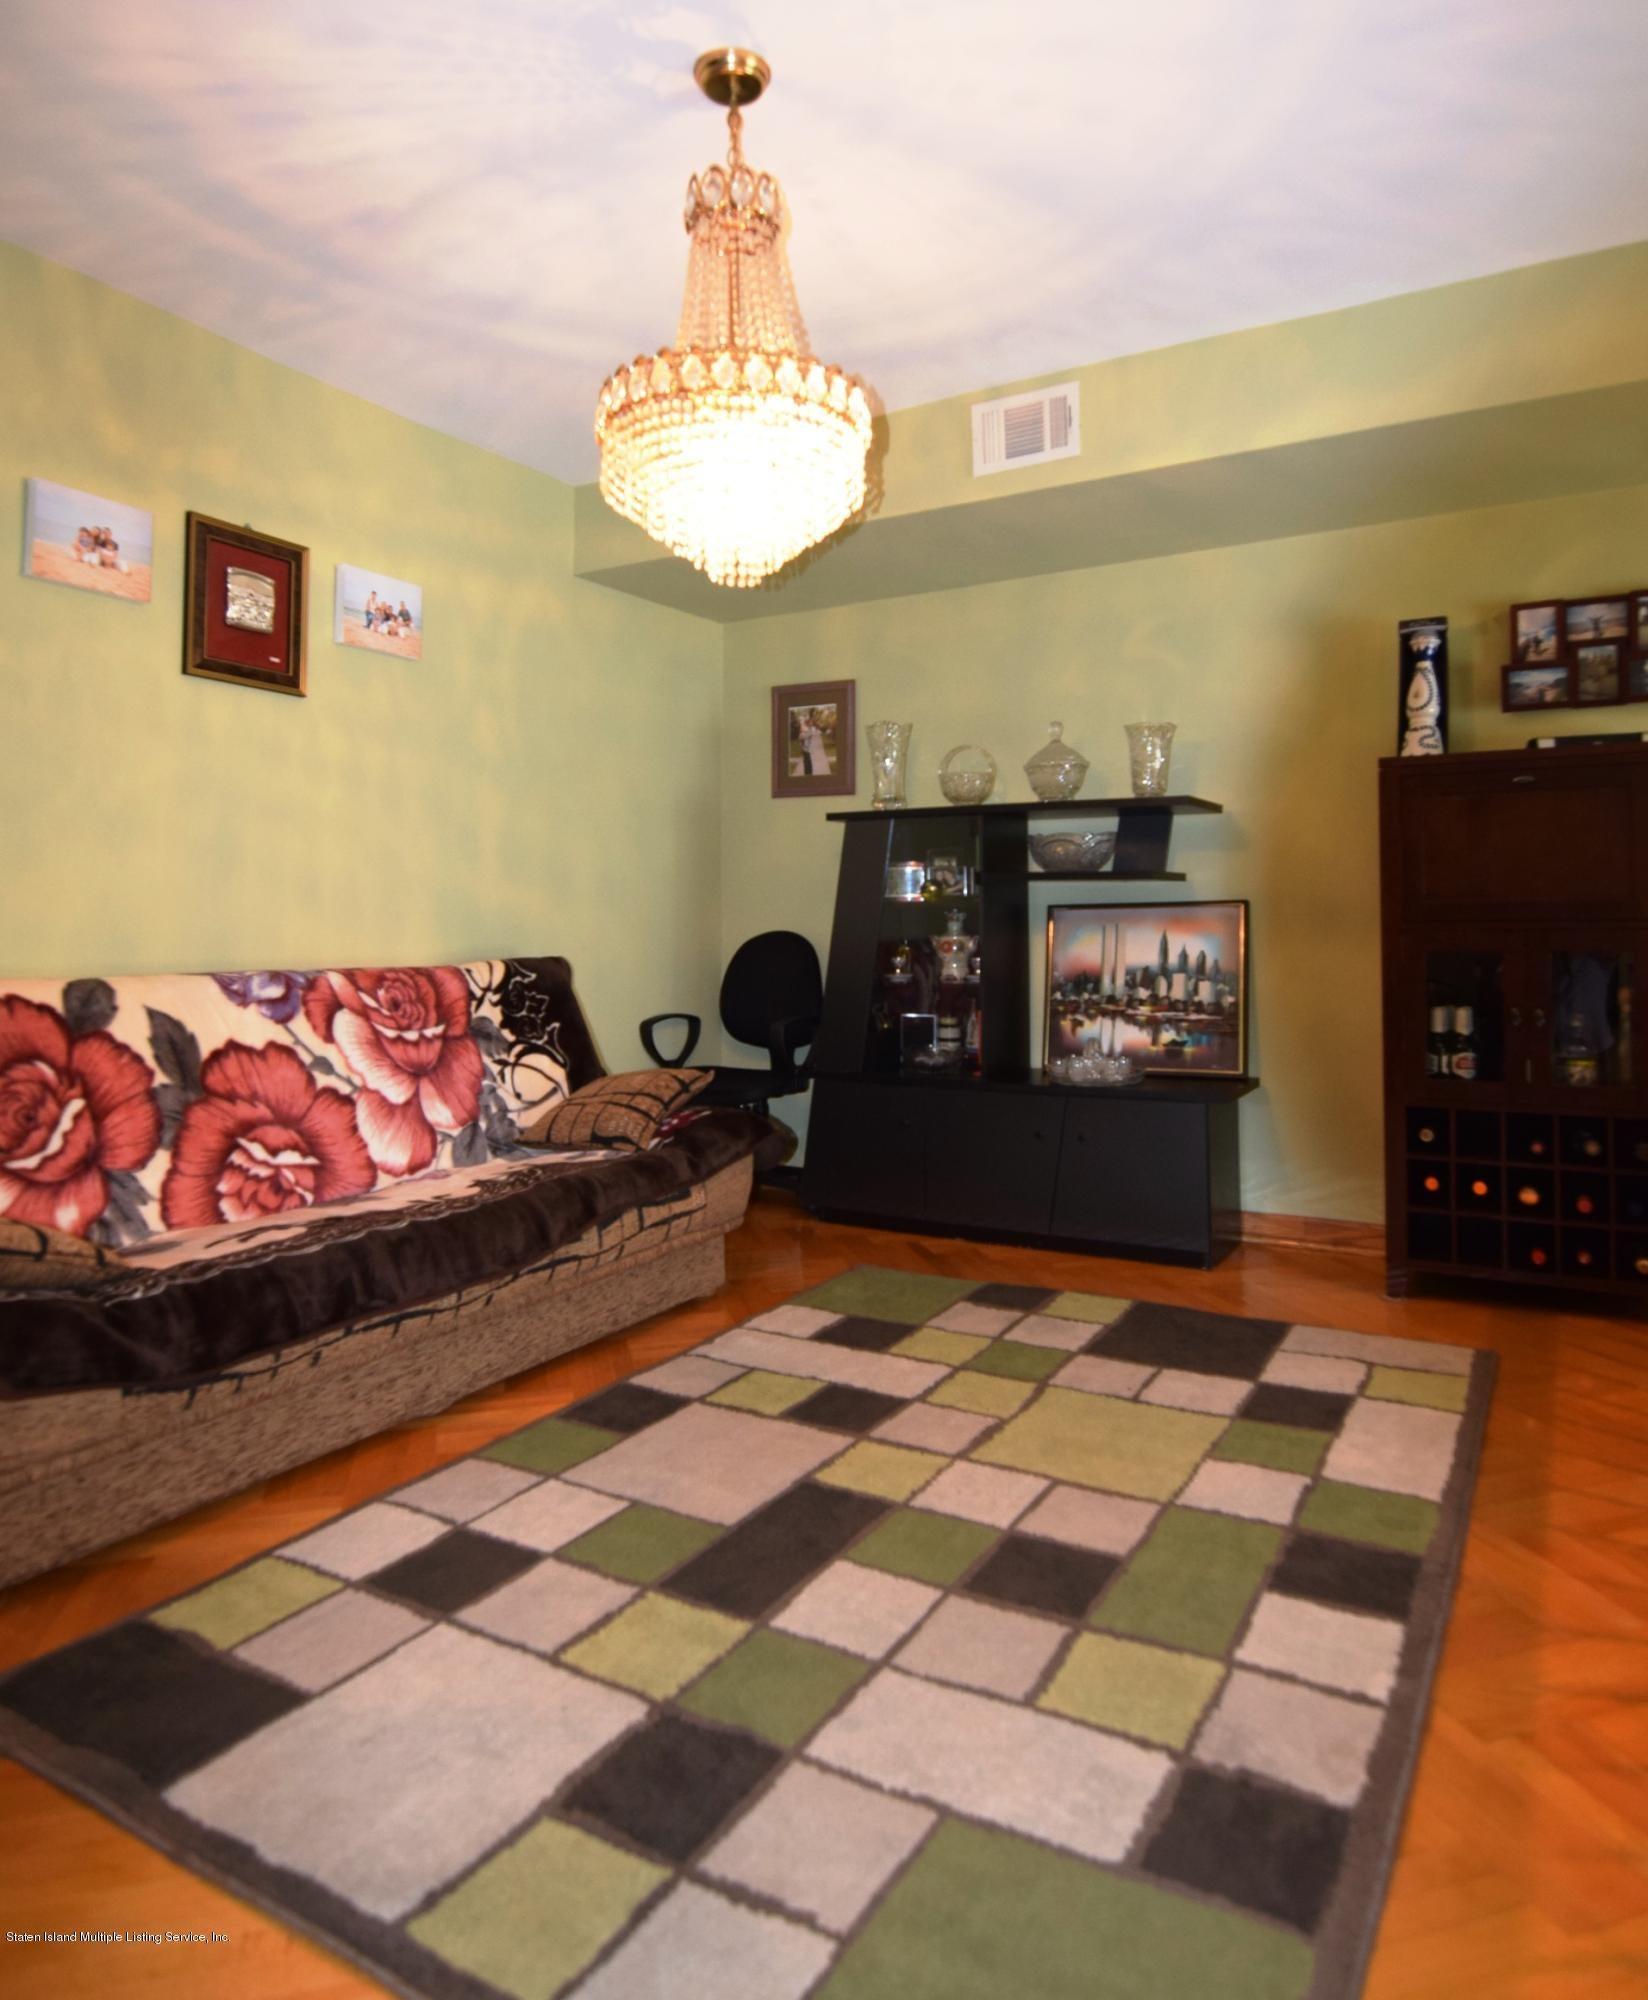 63 Commodore Drive,Staten Island,New York,10309,United States,3 Bedrooms Bedrooms,6 Rooms Rooms,2 BathroomsBathrooms,Res-Rental,Commodore,1114393